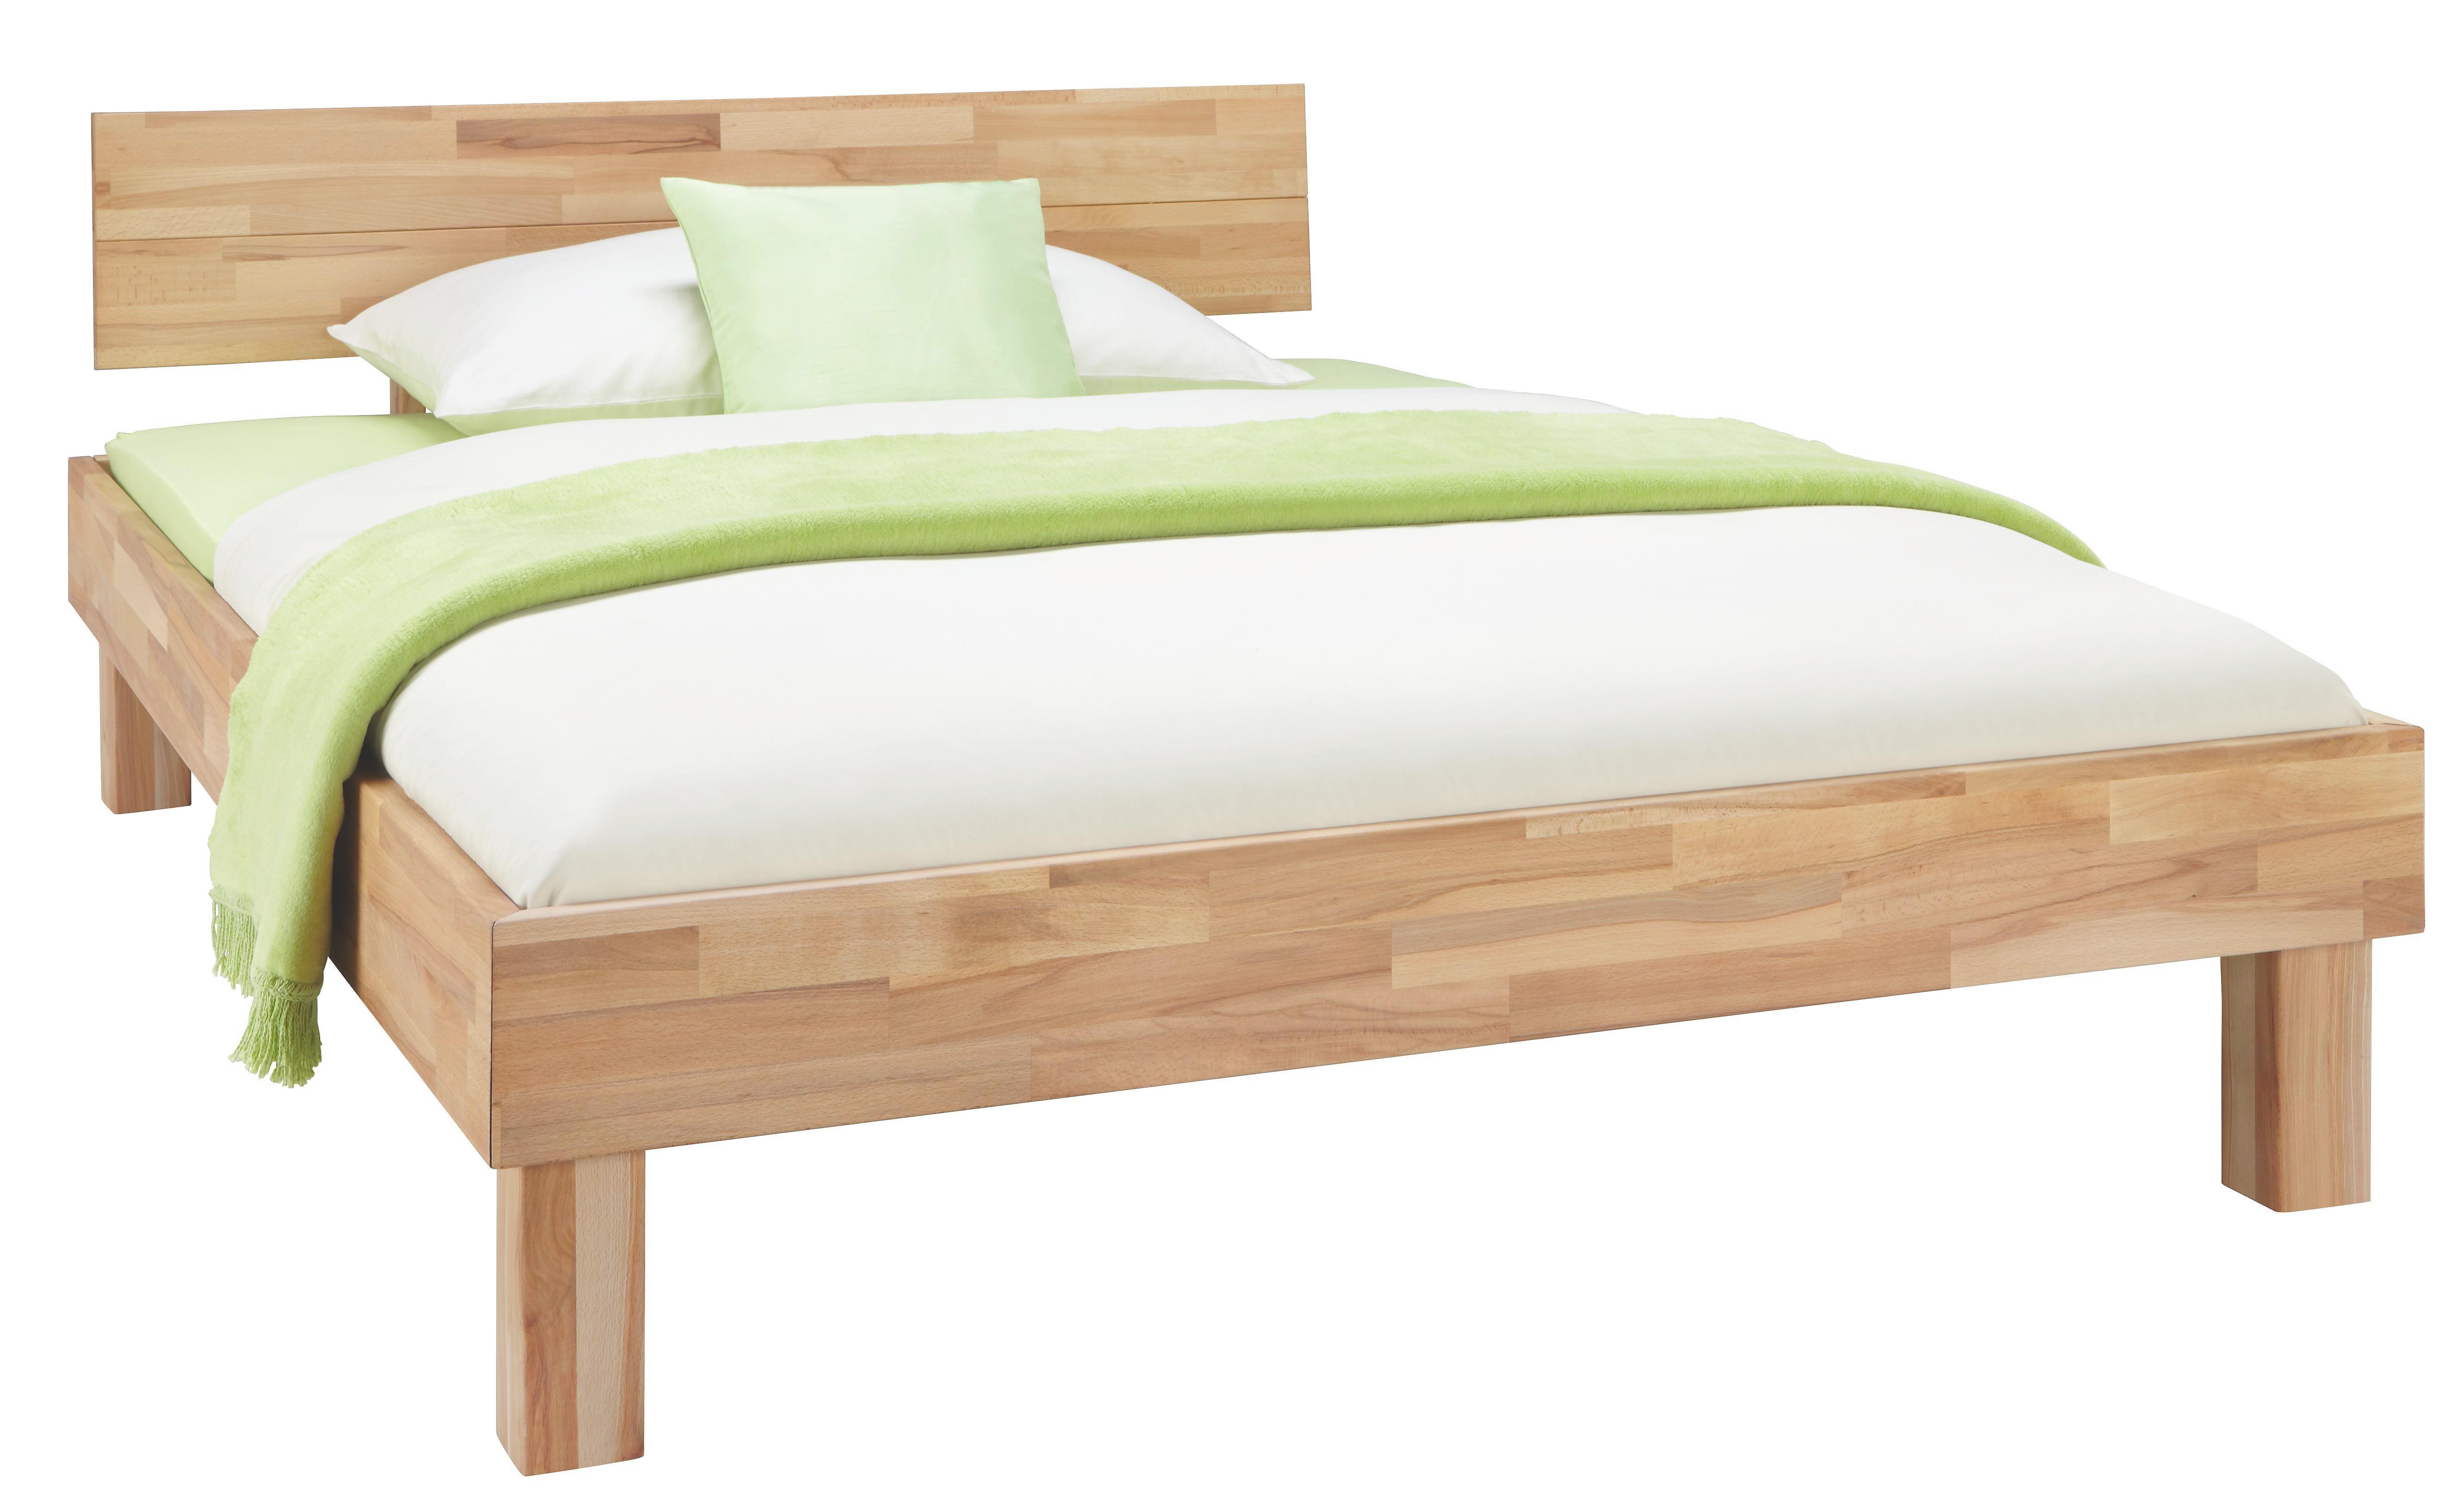 Bett in Natur, ca. 140x200cm - Naturfarben, KONVENTIONELL, Holz (211,5/145/80cm) - ZANDIARA